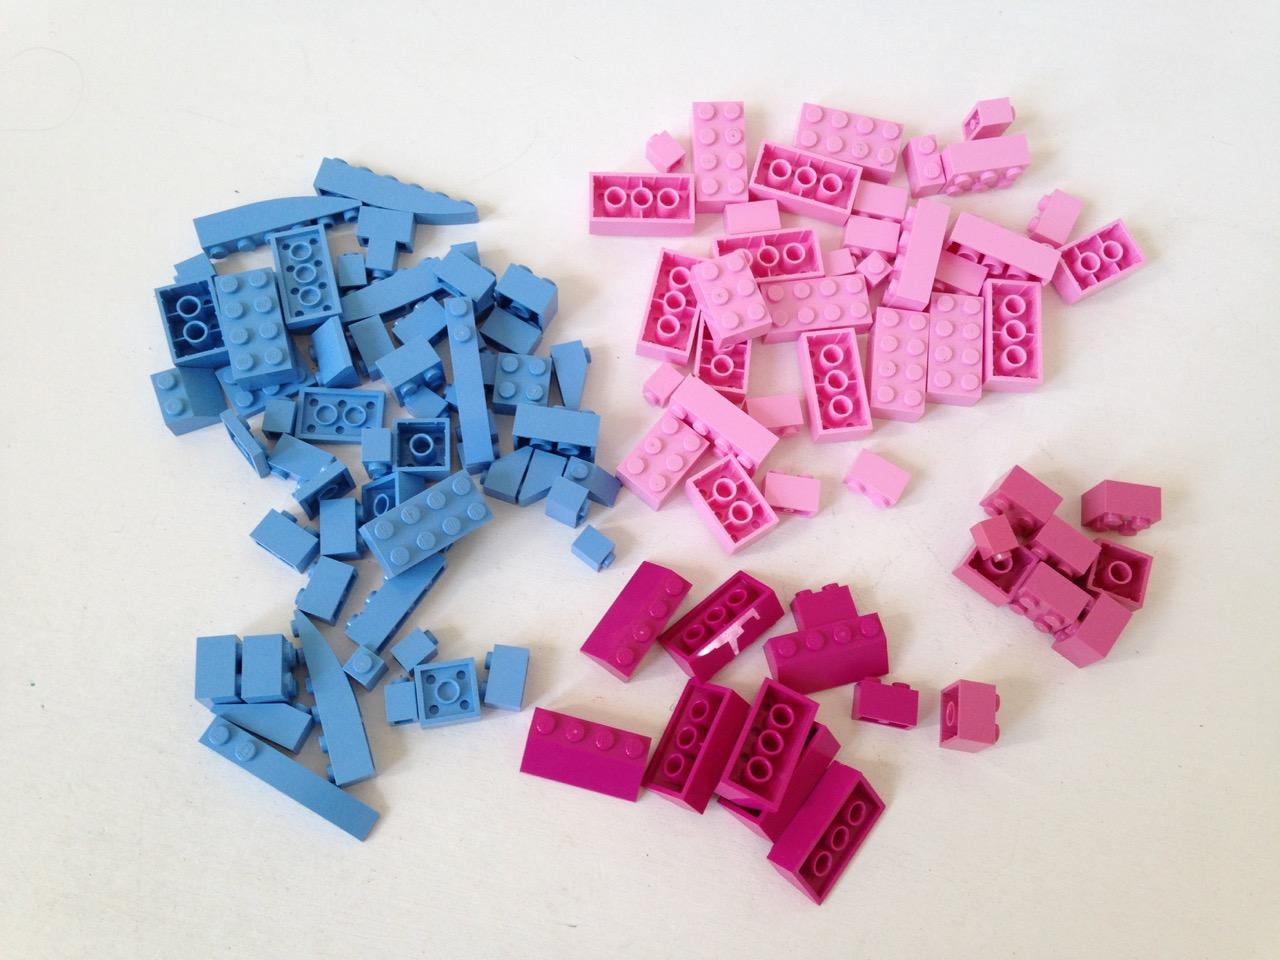 LE023 LEGO BRICKS, SLOPES & PLATES RARE COLOURS 116 PCS.